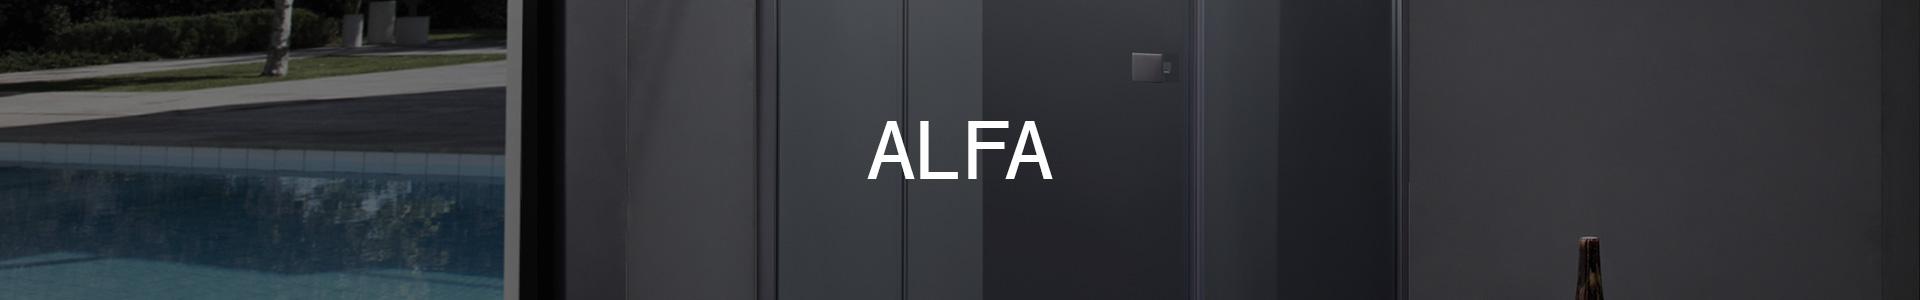 alfa-header